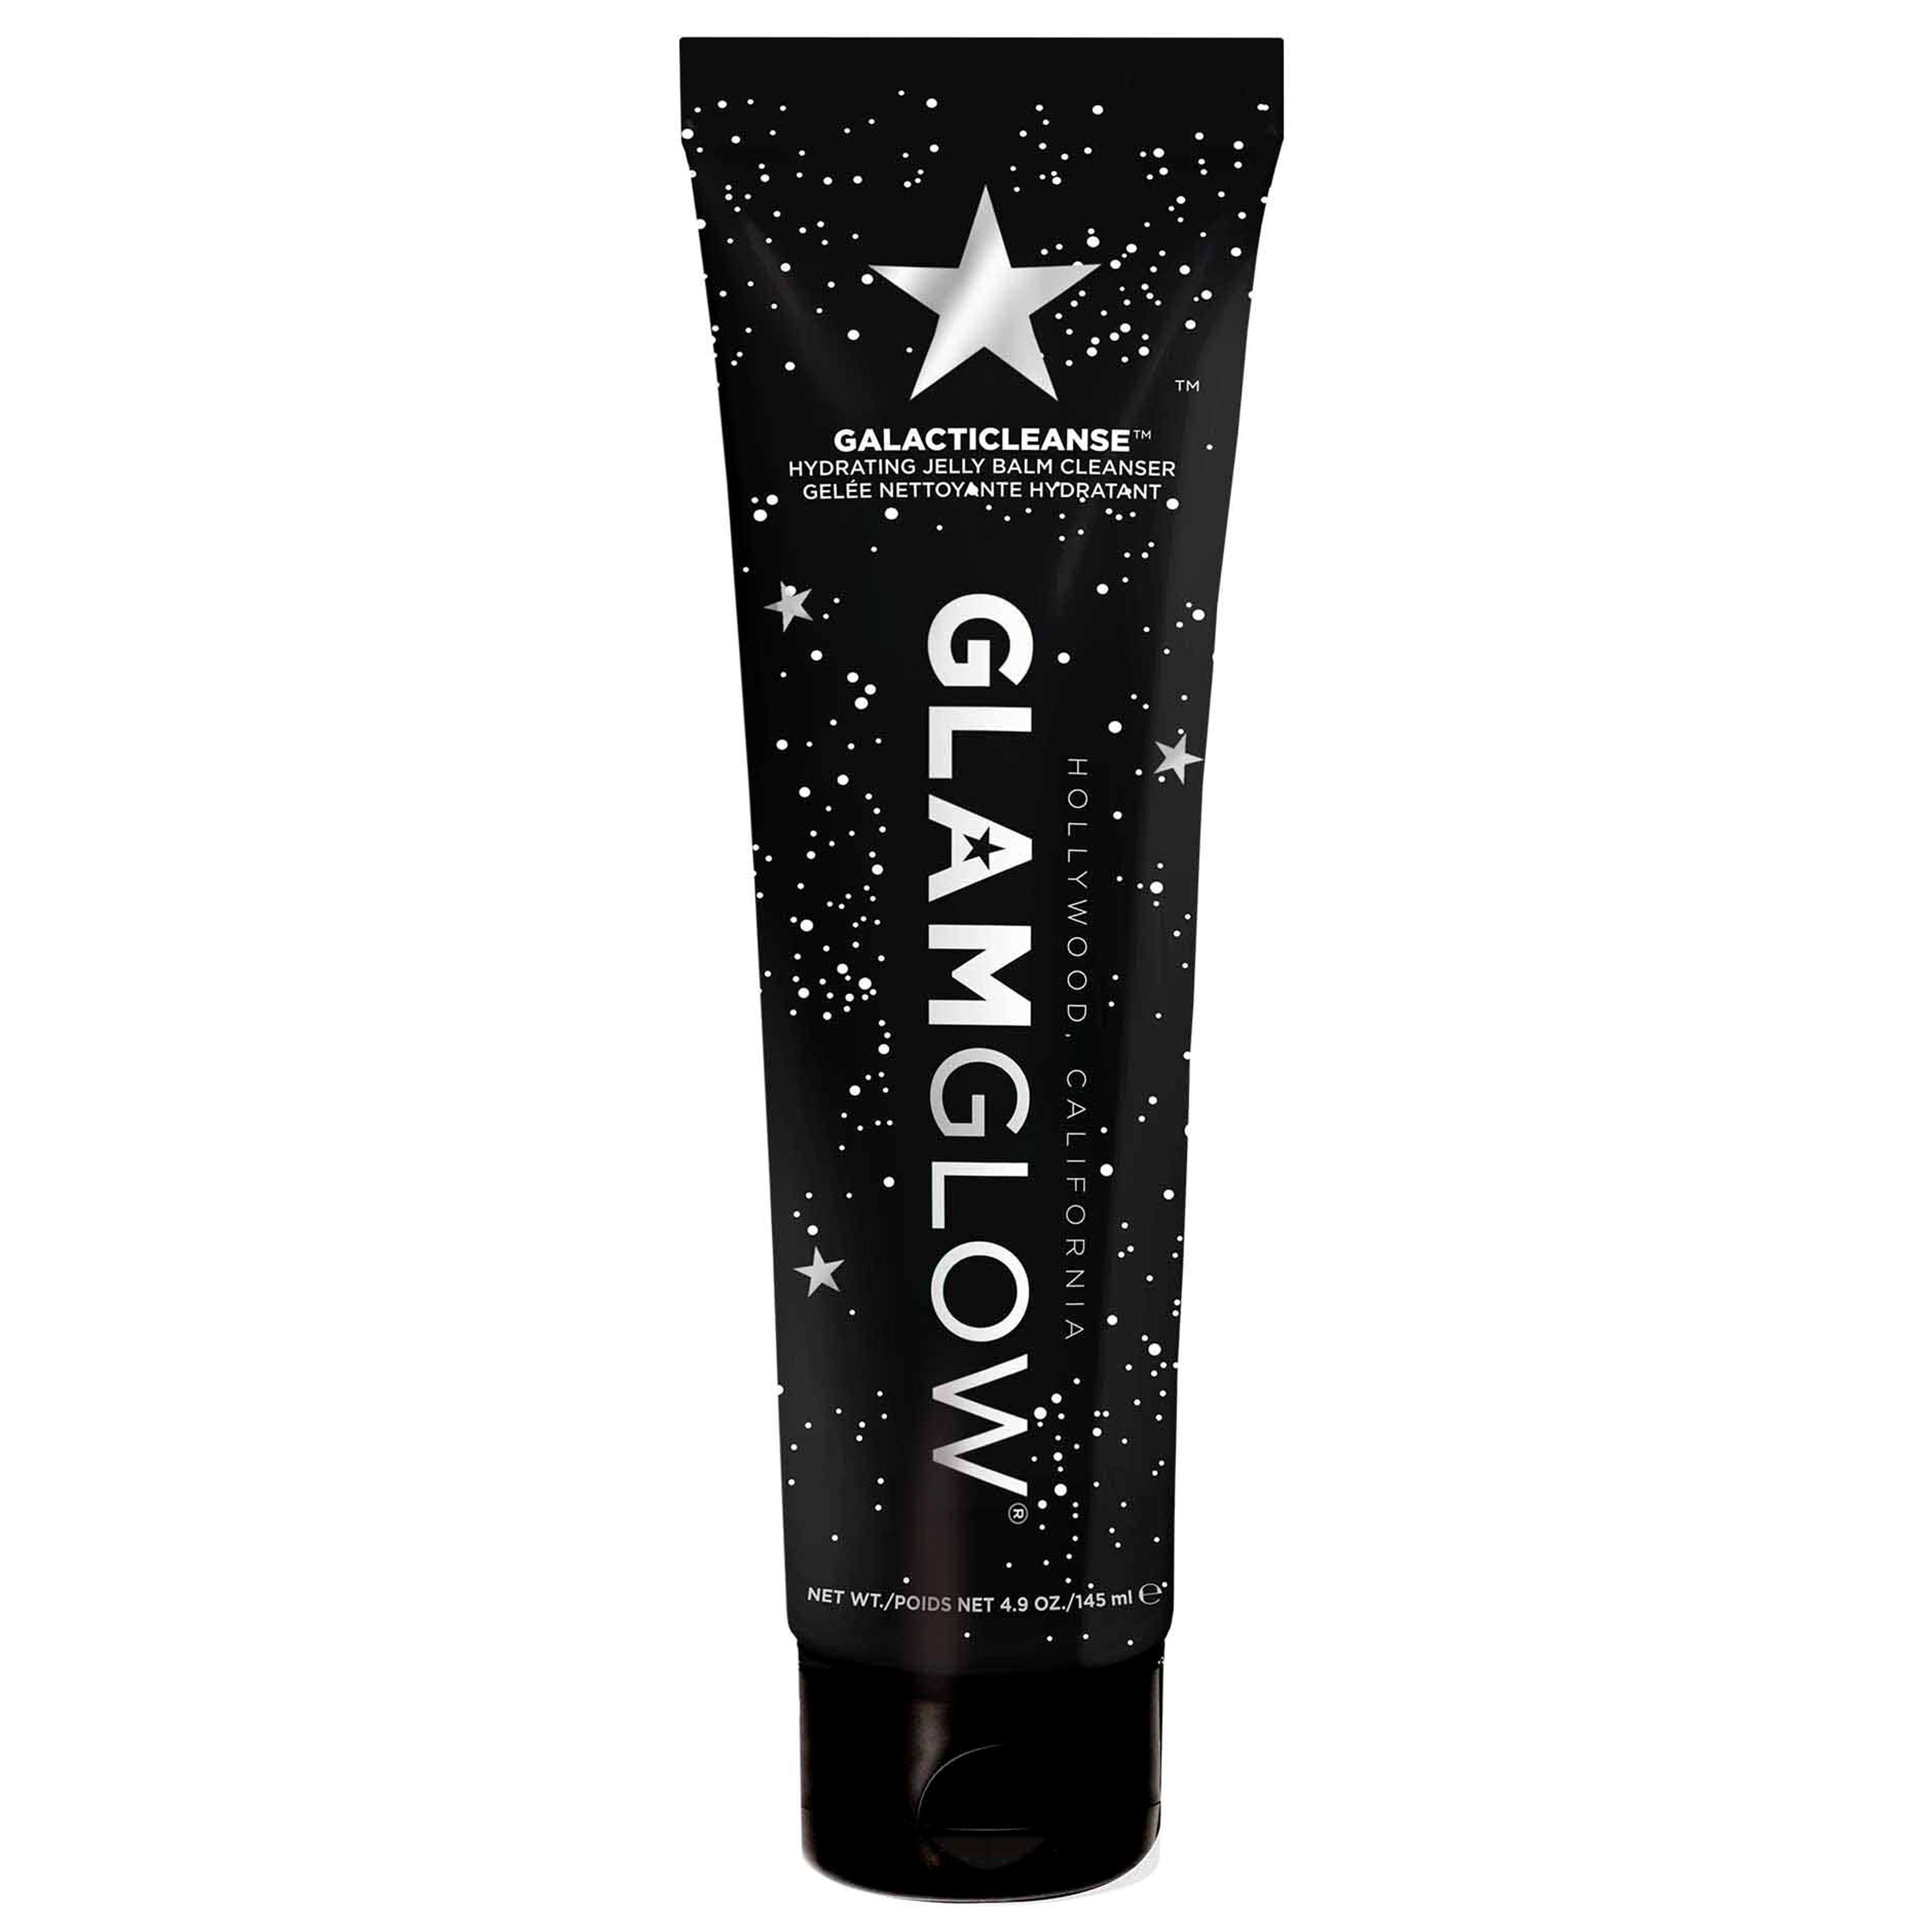 Glamglow Galacticleanse Hydrating Jelly Balm Cleanser Θρεπτικό Γαλάκτωμα Καθαρισμού 145ml